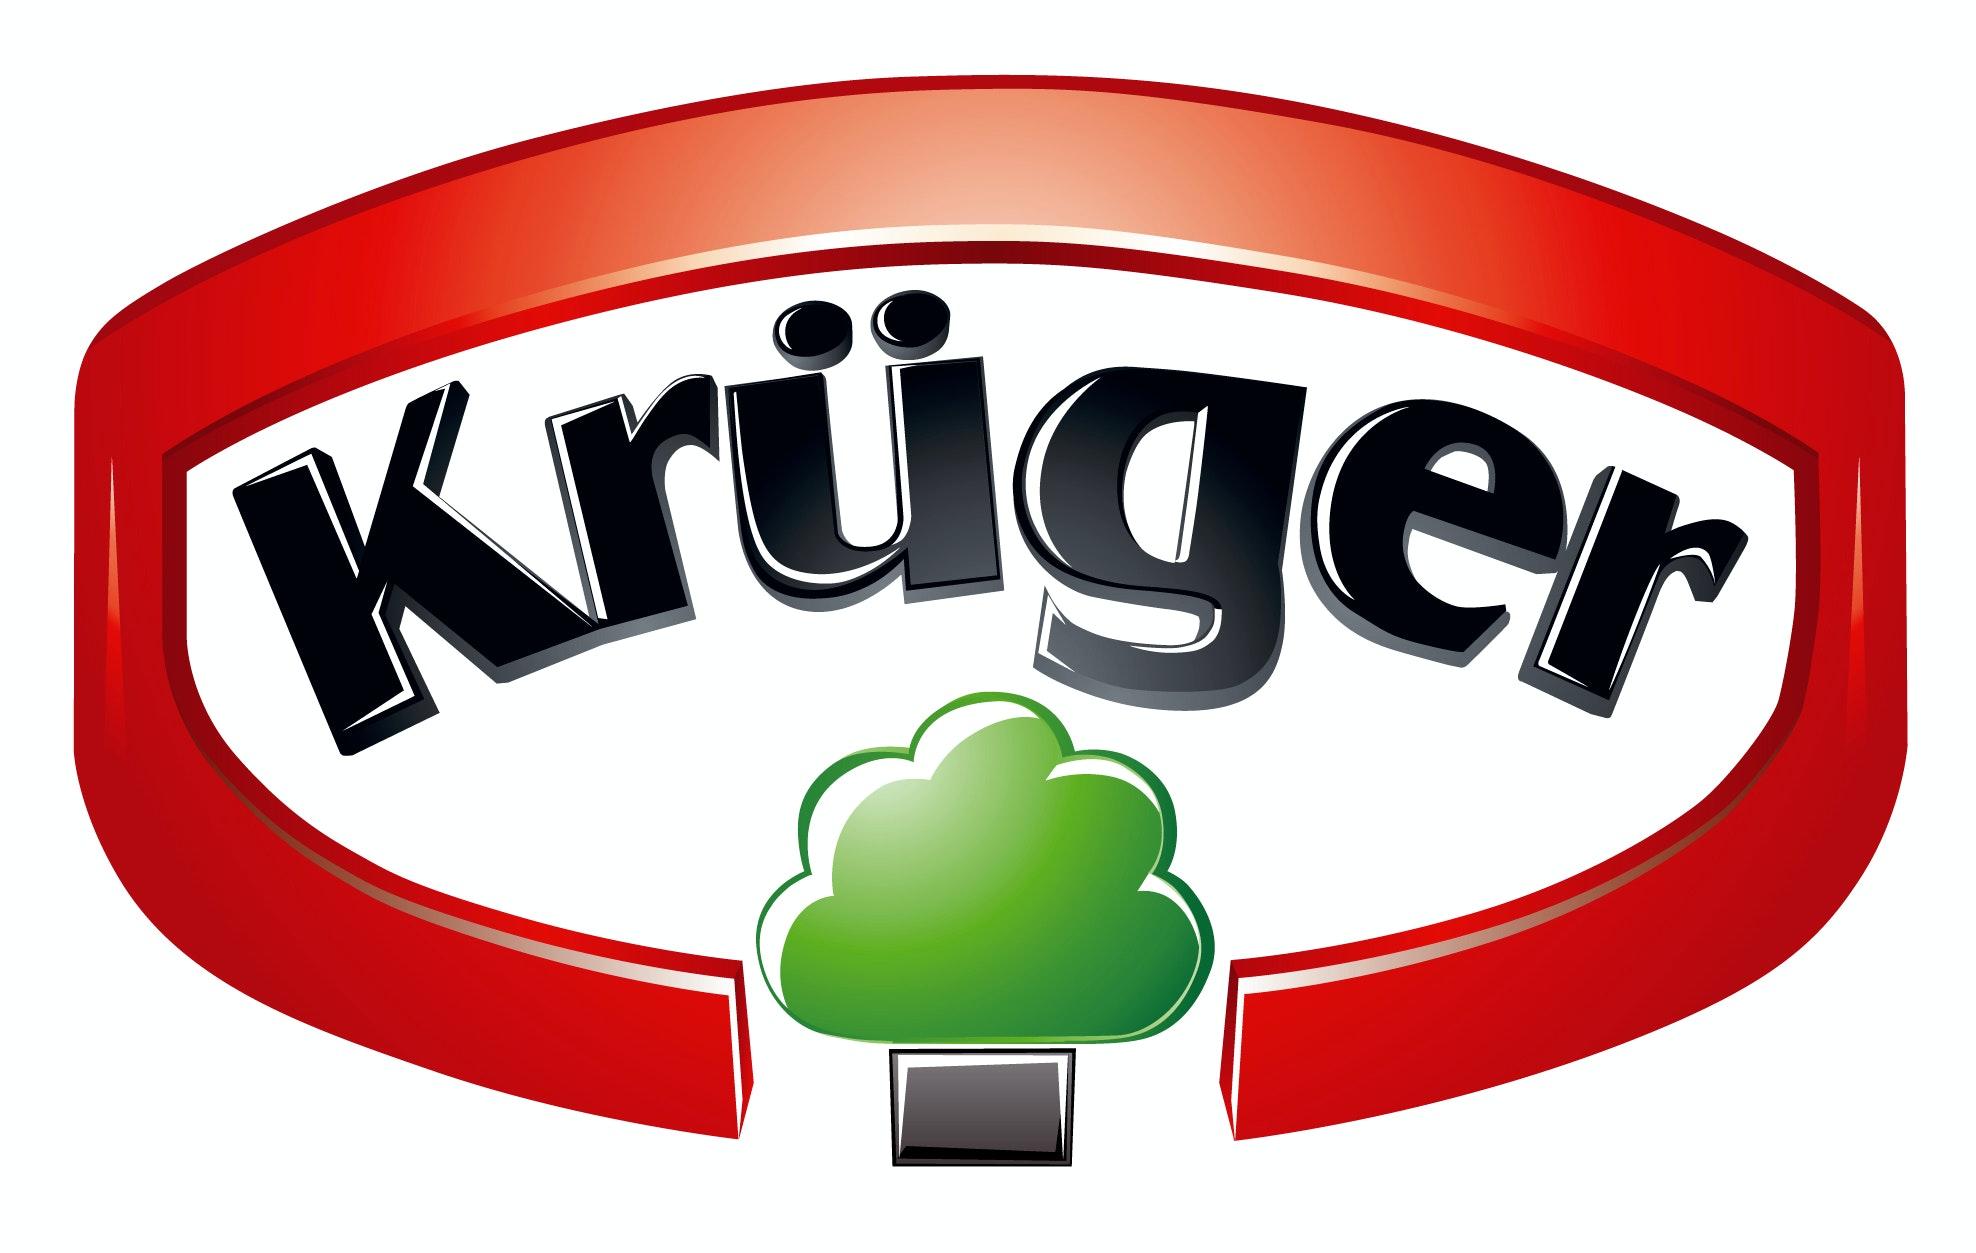 Krüger GmbH & Co.KG